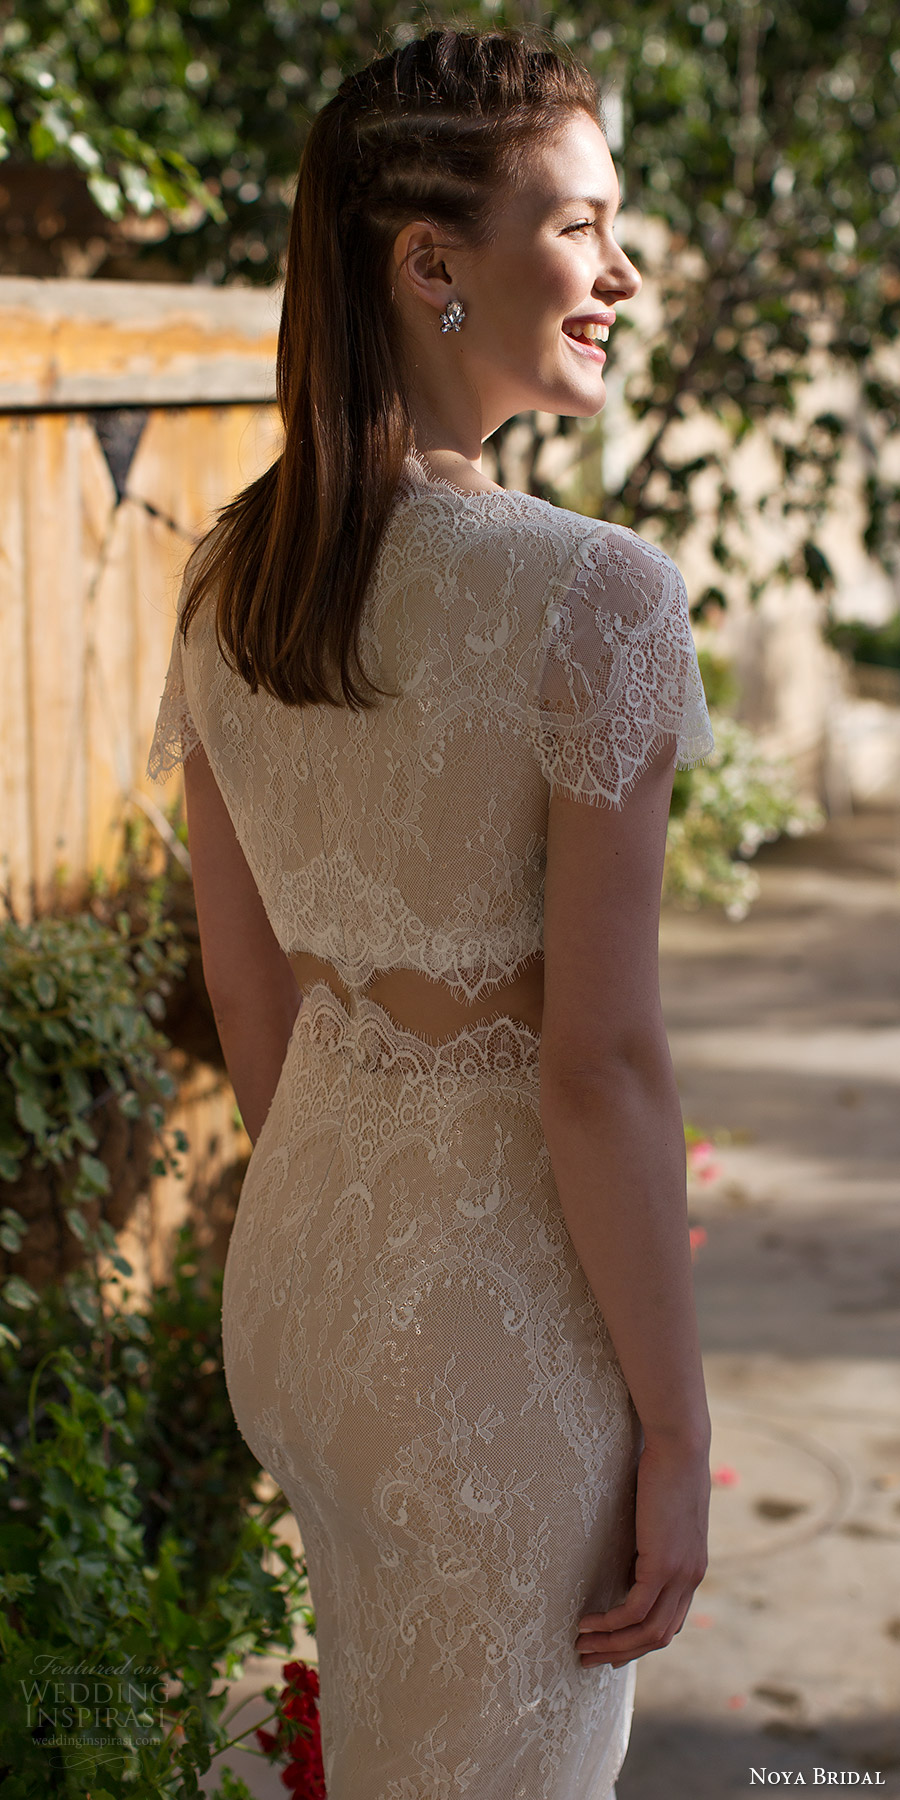 noya bridal 2016 short sleeves jewel neck sheath lace wedding dress (1213) bv edgy crop top